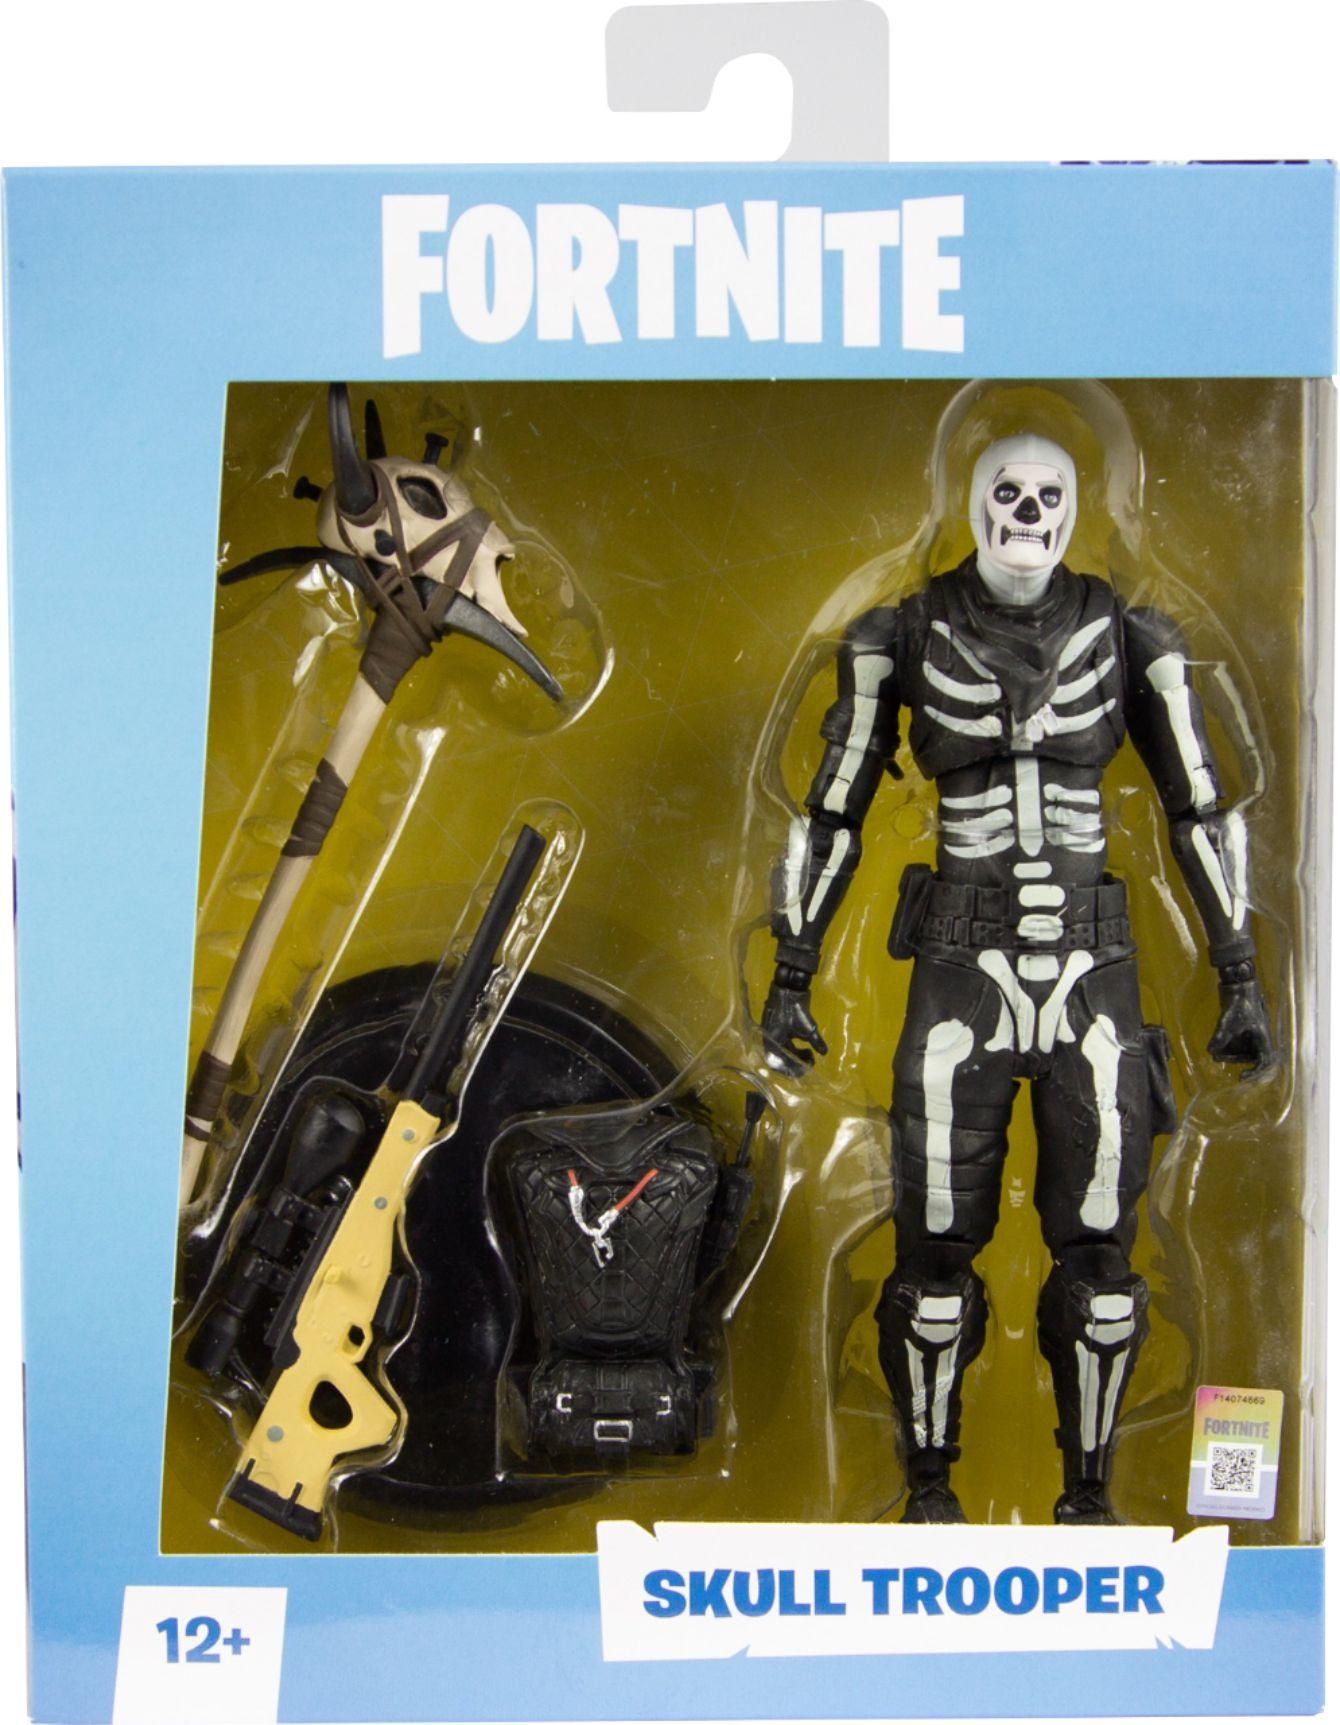 Mcfarlane Toys Fortnite Skull Trooper Premium Action Figure, Multicolor